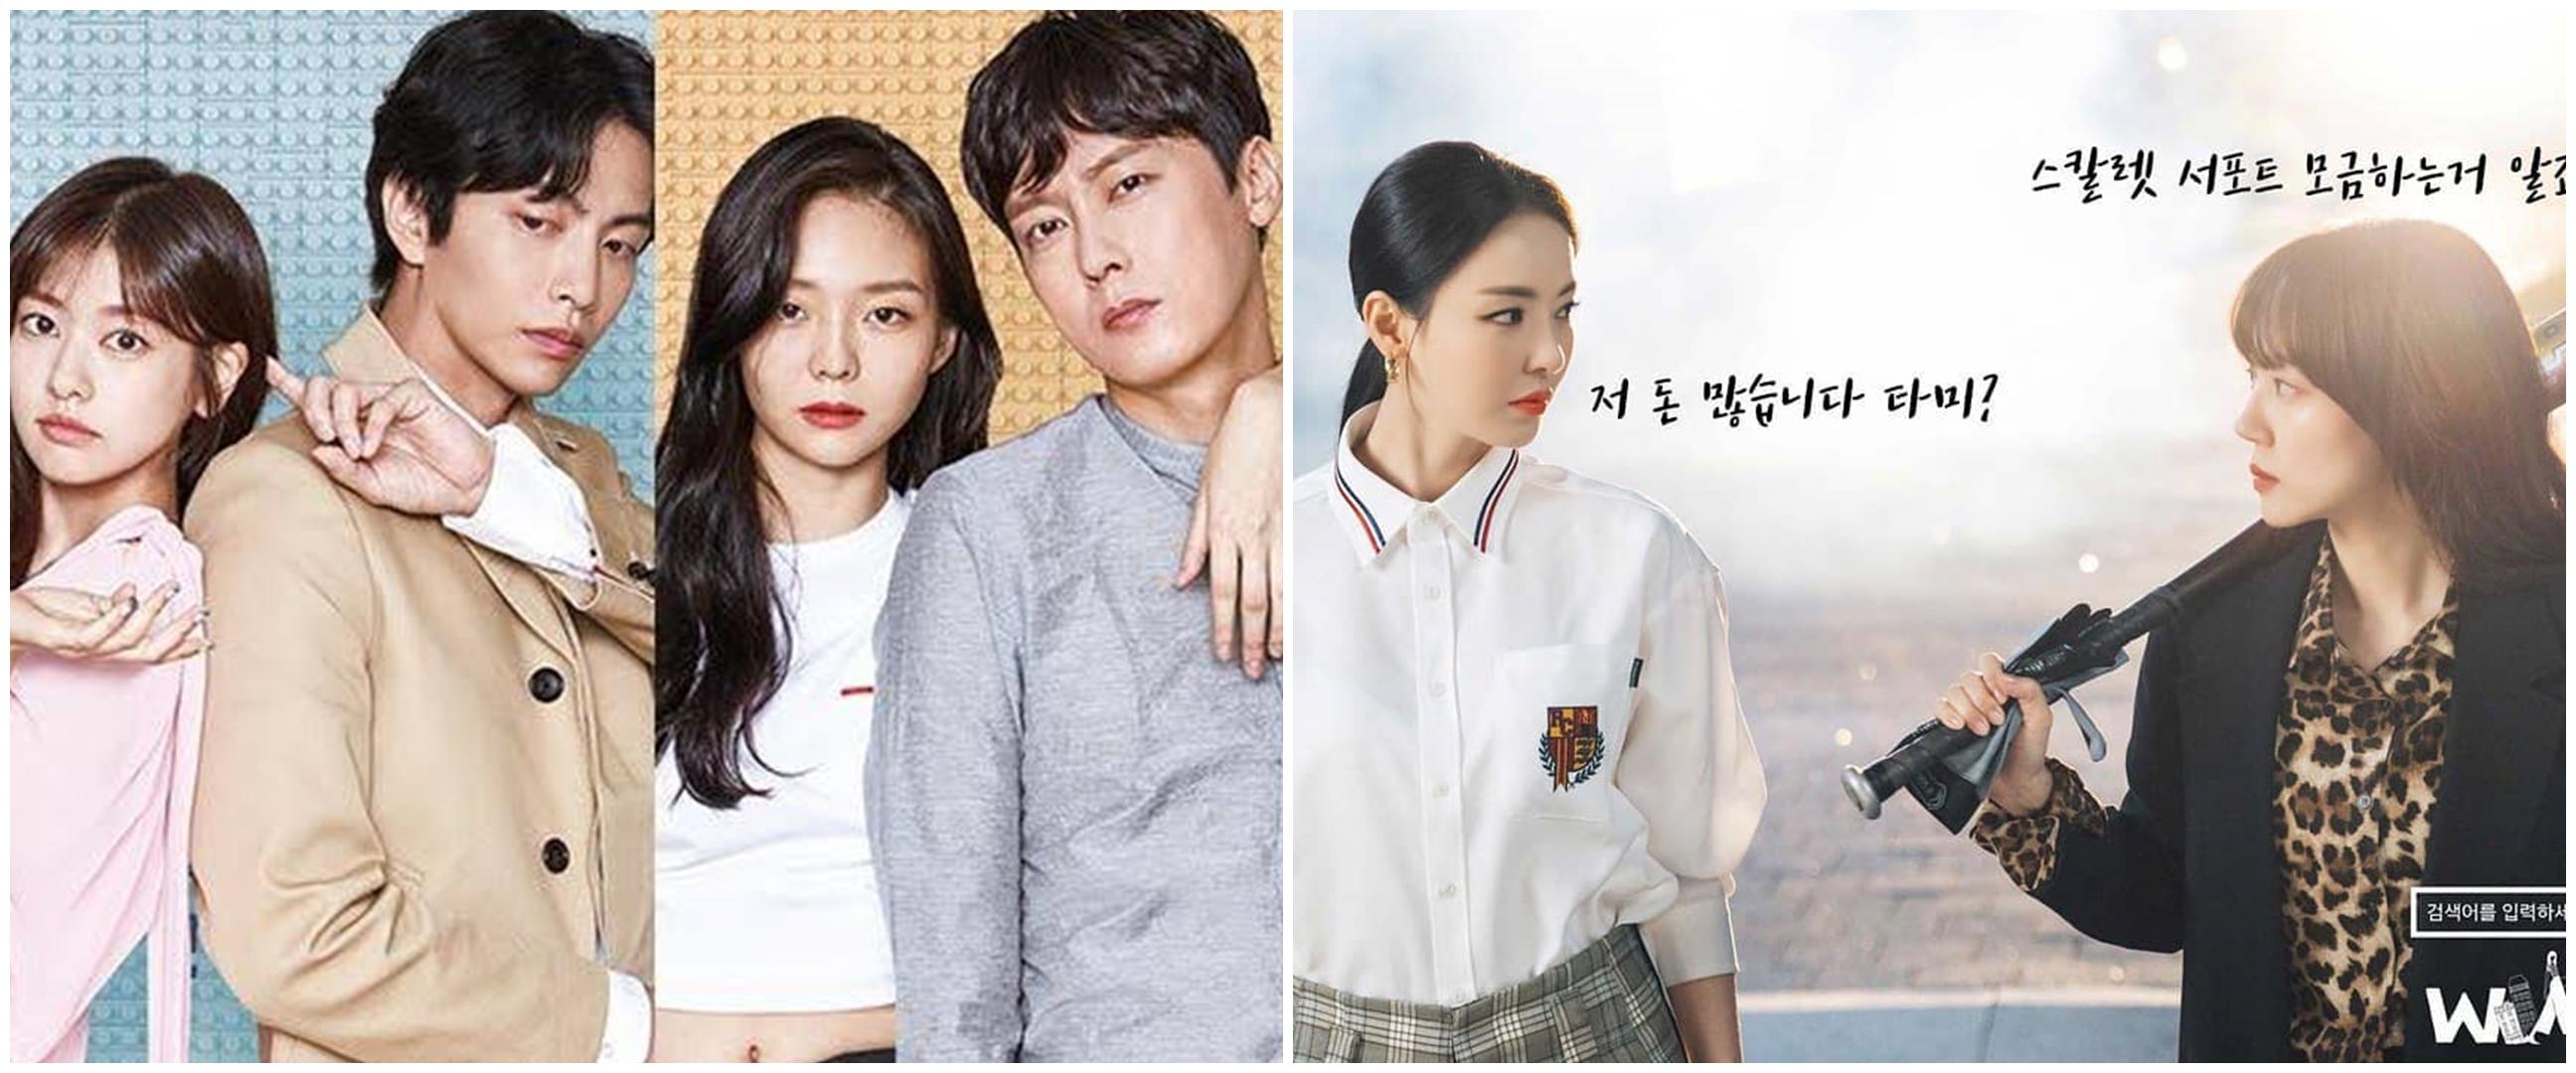 6 Drama Korea tentang friendship goals, bikin pengen reuni